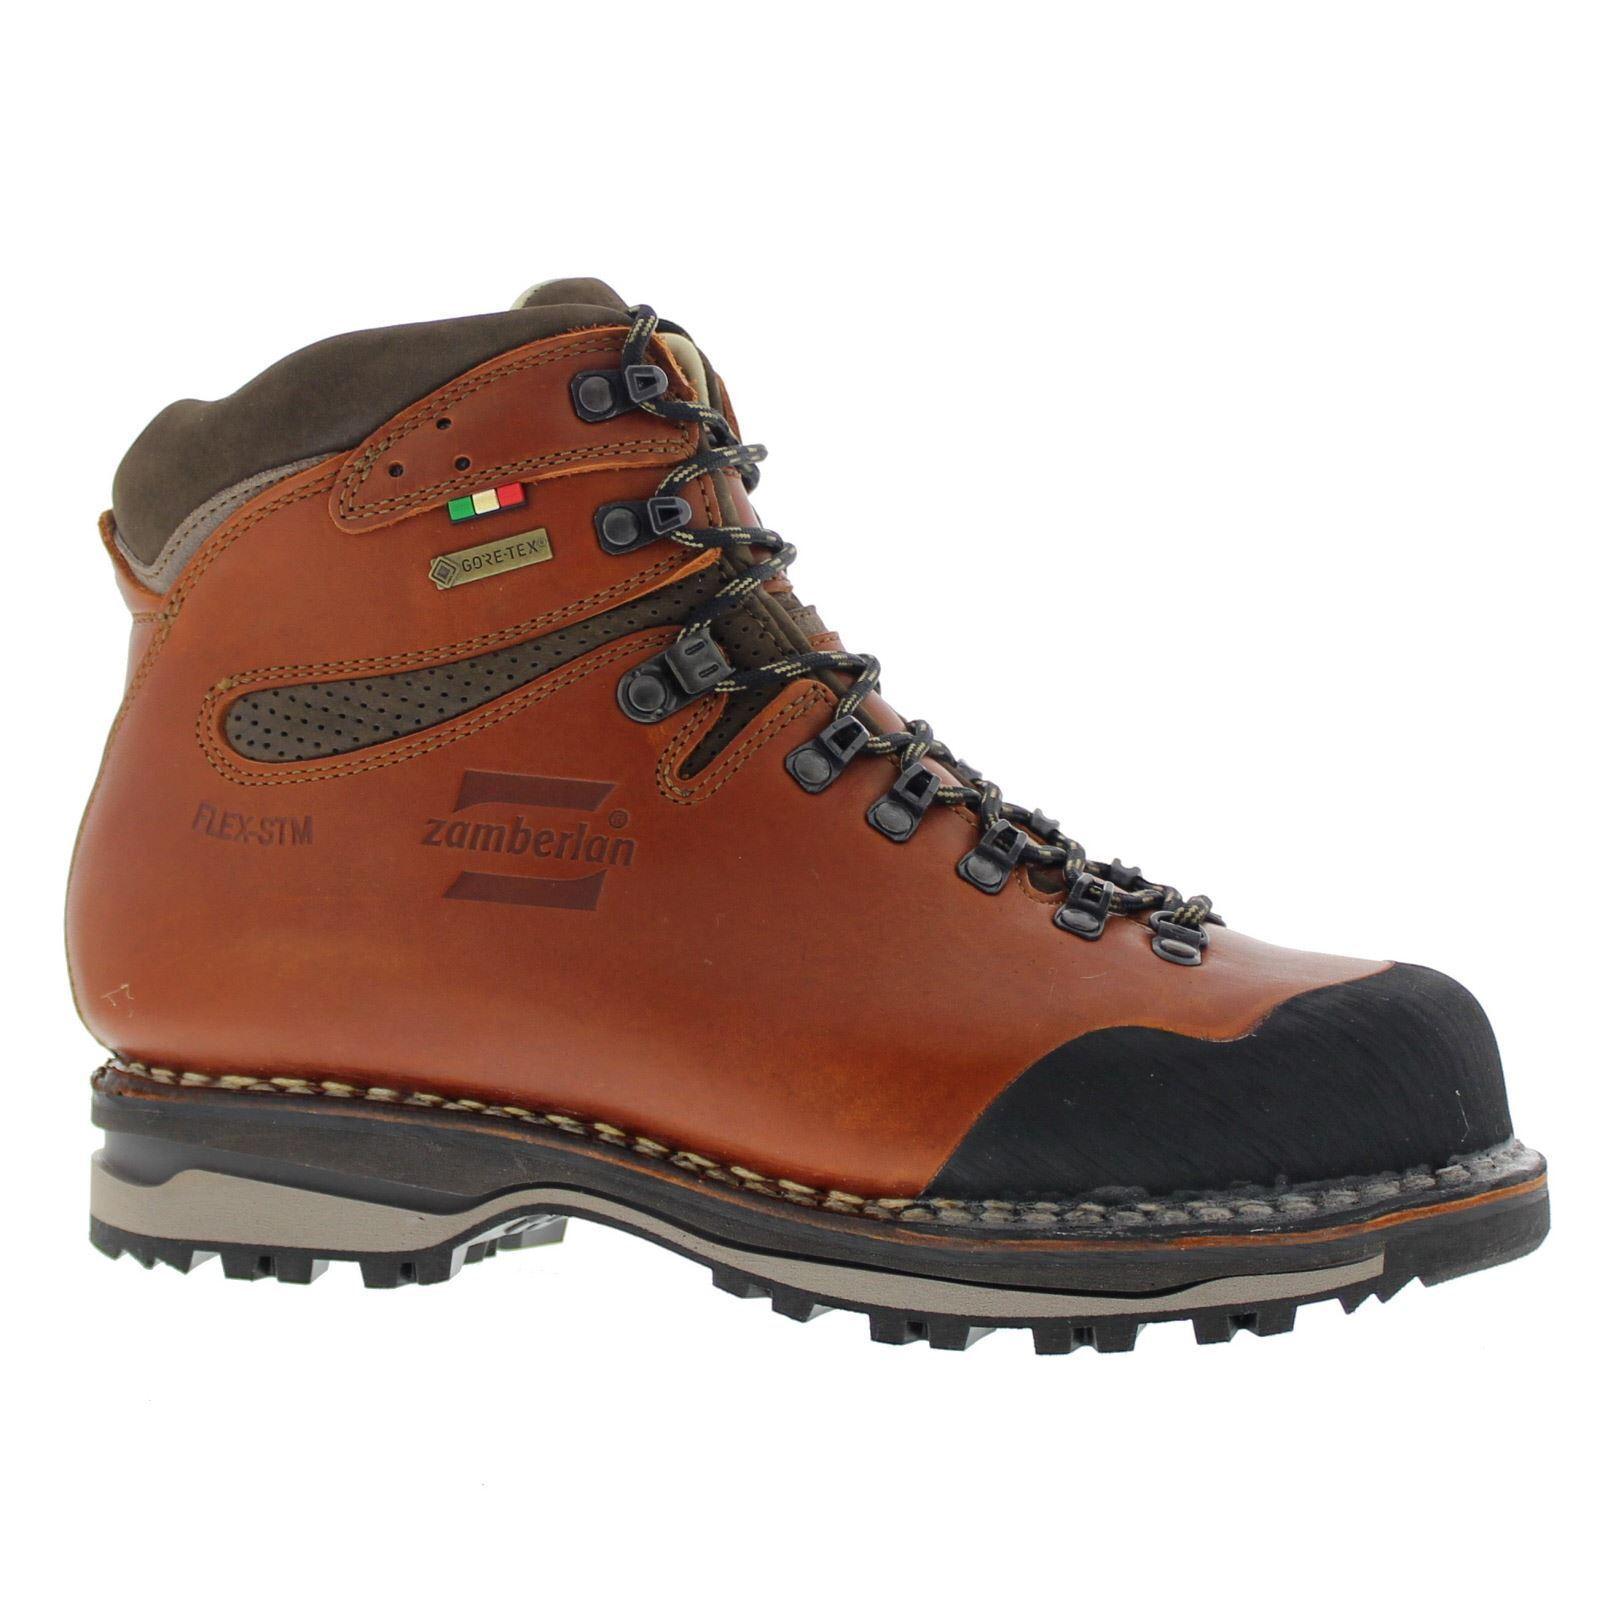 Zamberlan 1025 Tofane Nw Gore-Tex RR Brick Mens Mountaineering Boots